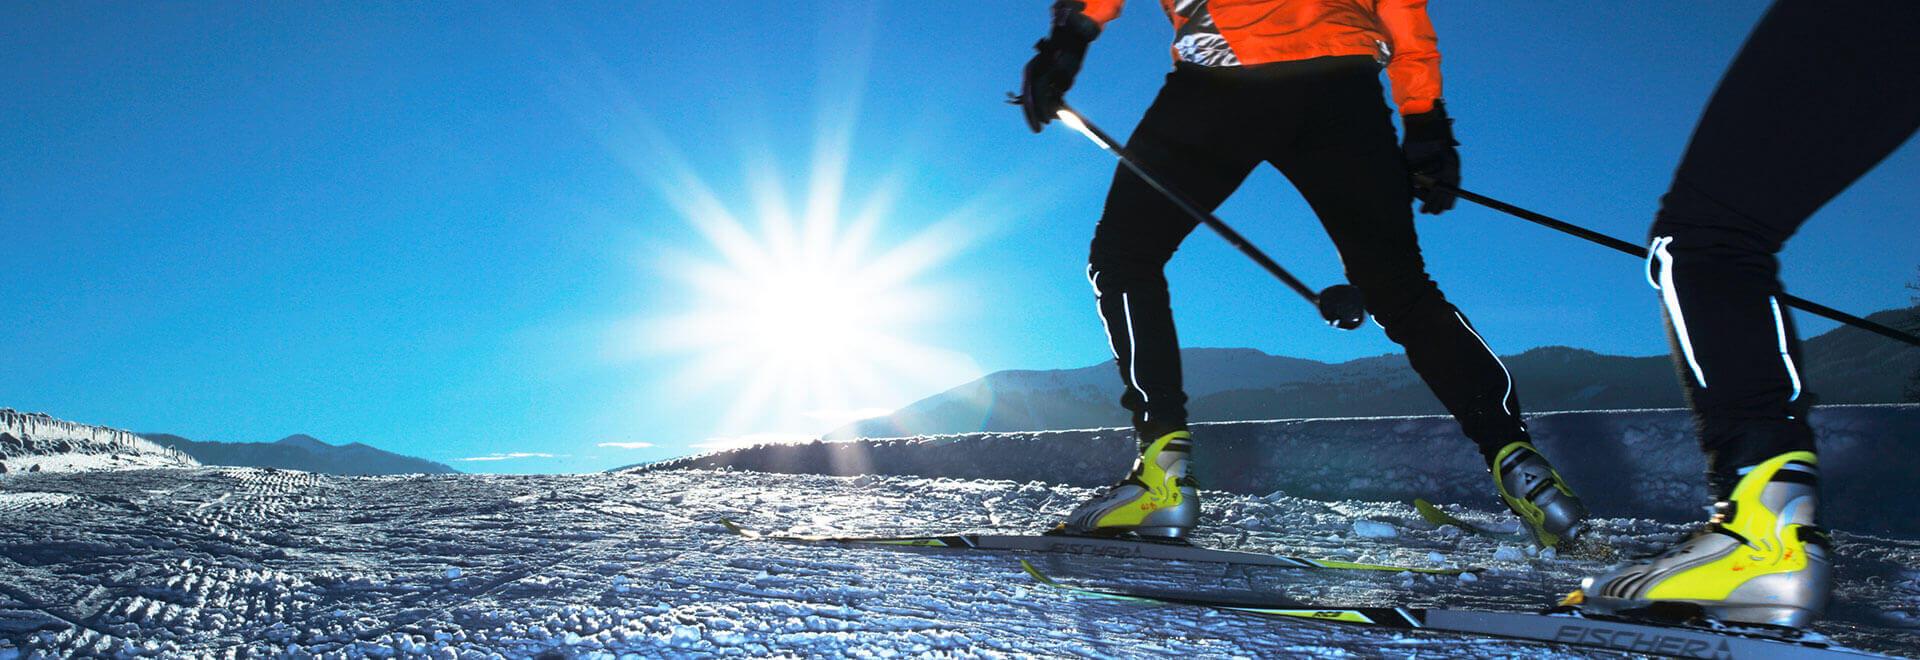 Nordic Ski in Saalbach Hinterglem